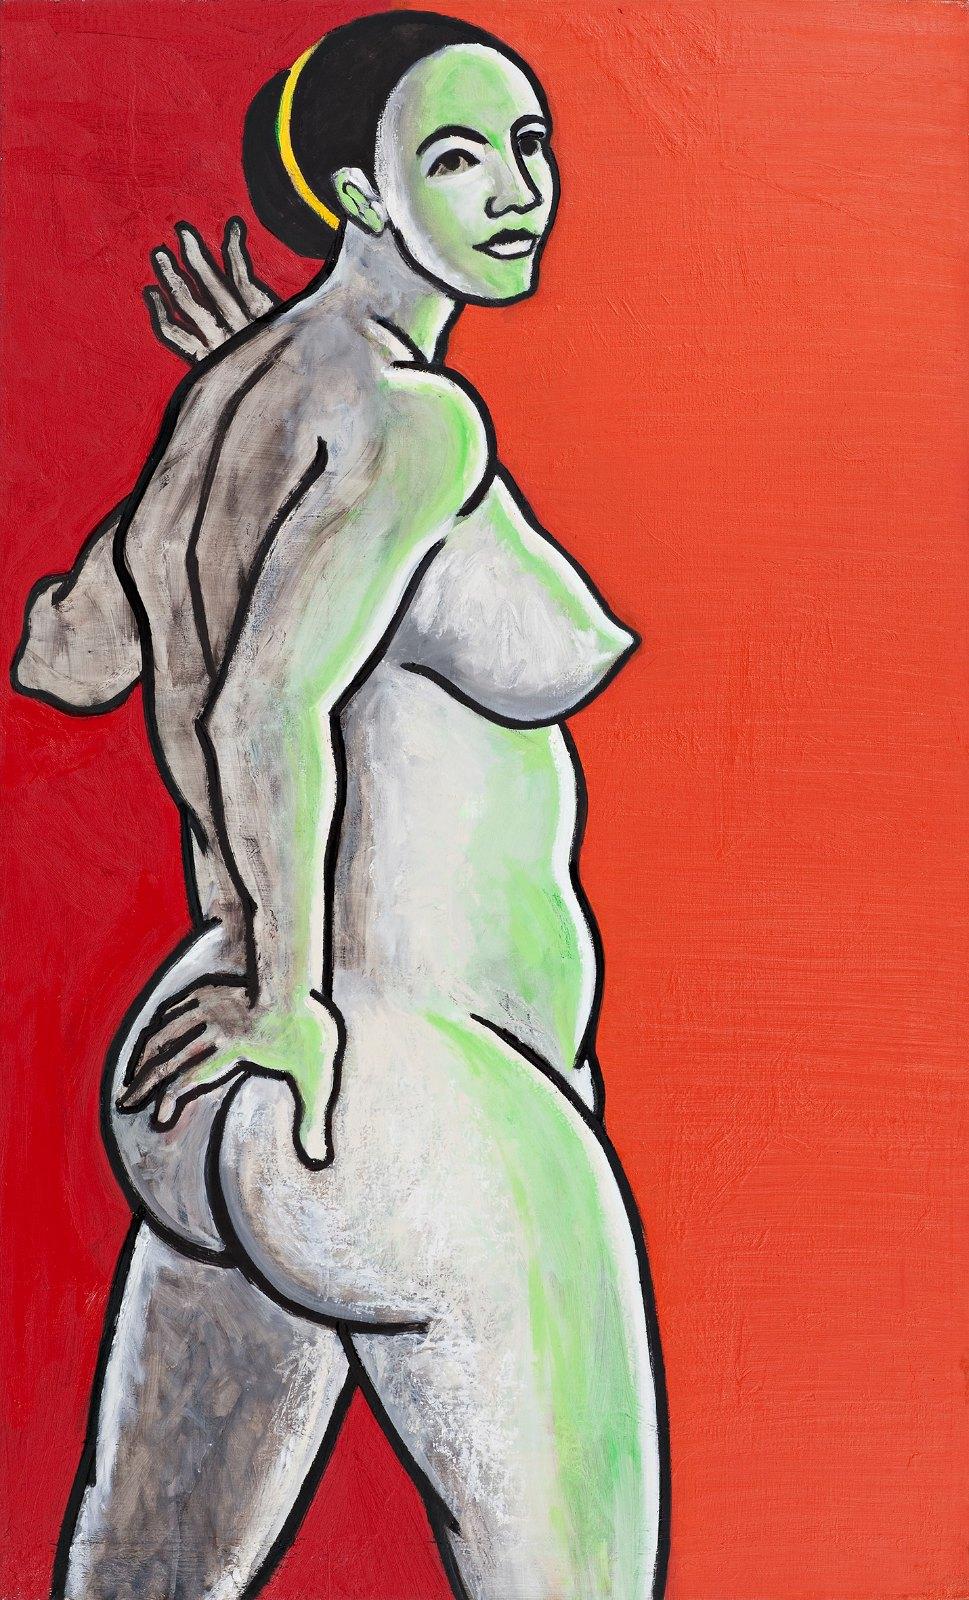 Une grande dame, 2009-2010, oil on canvas, 146 x 89 cm